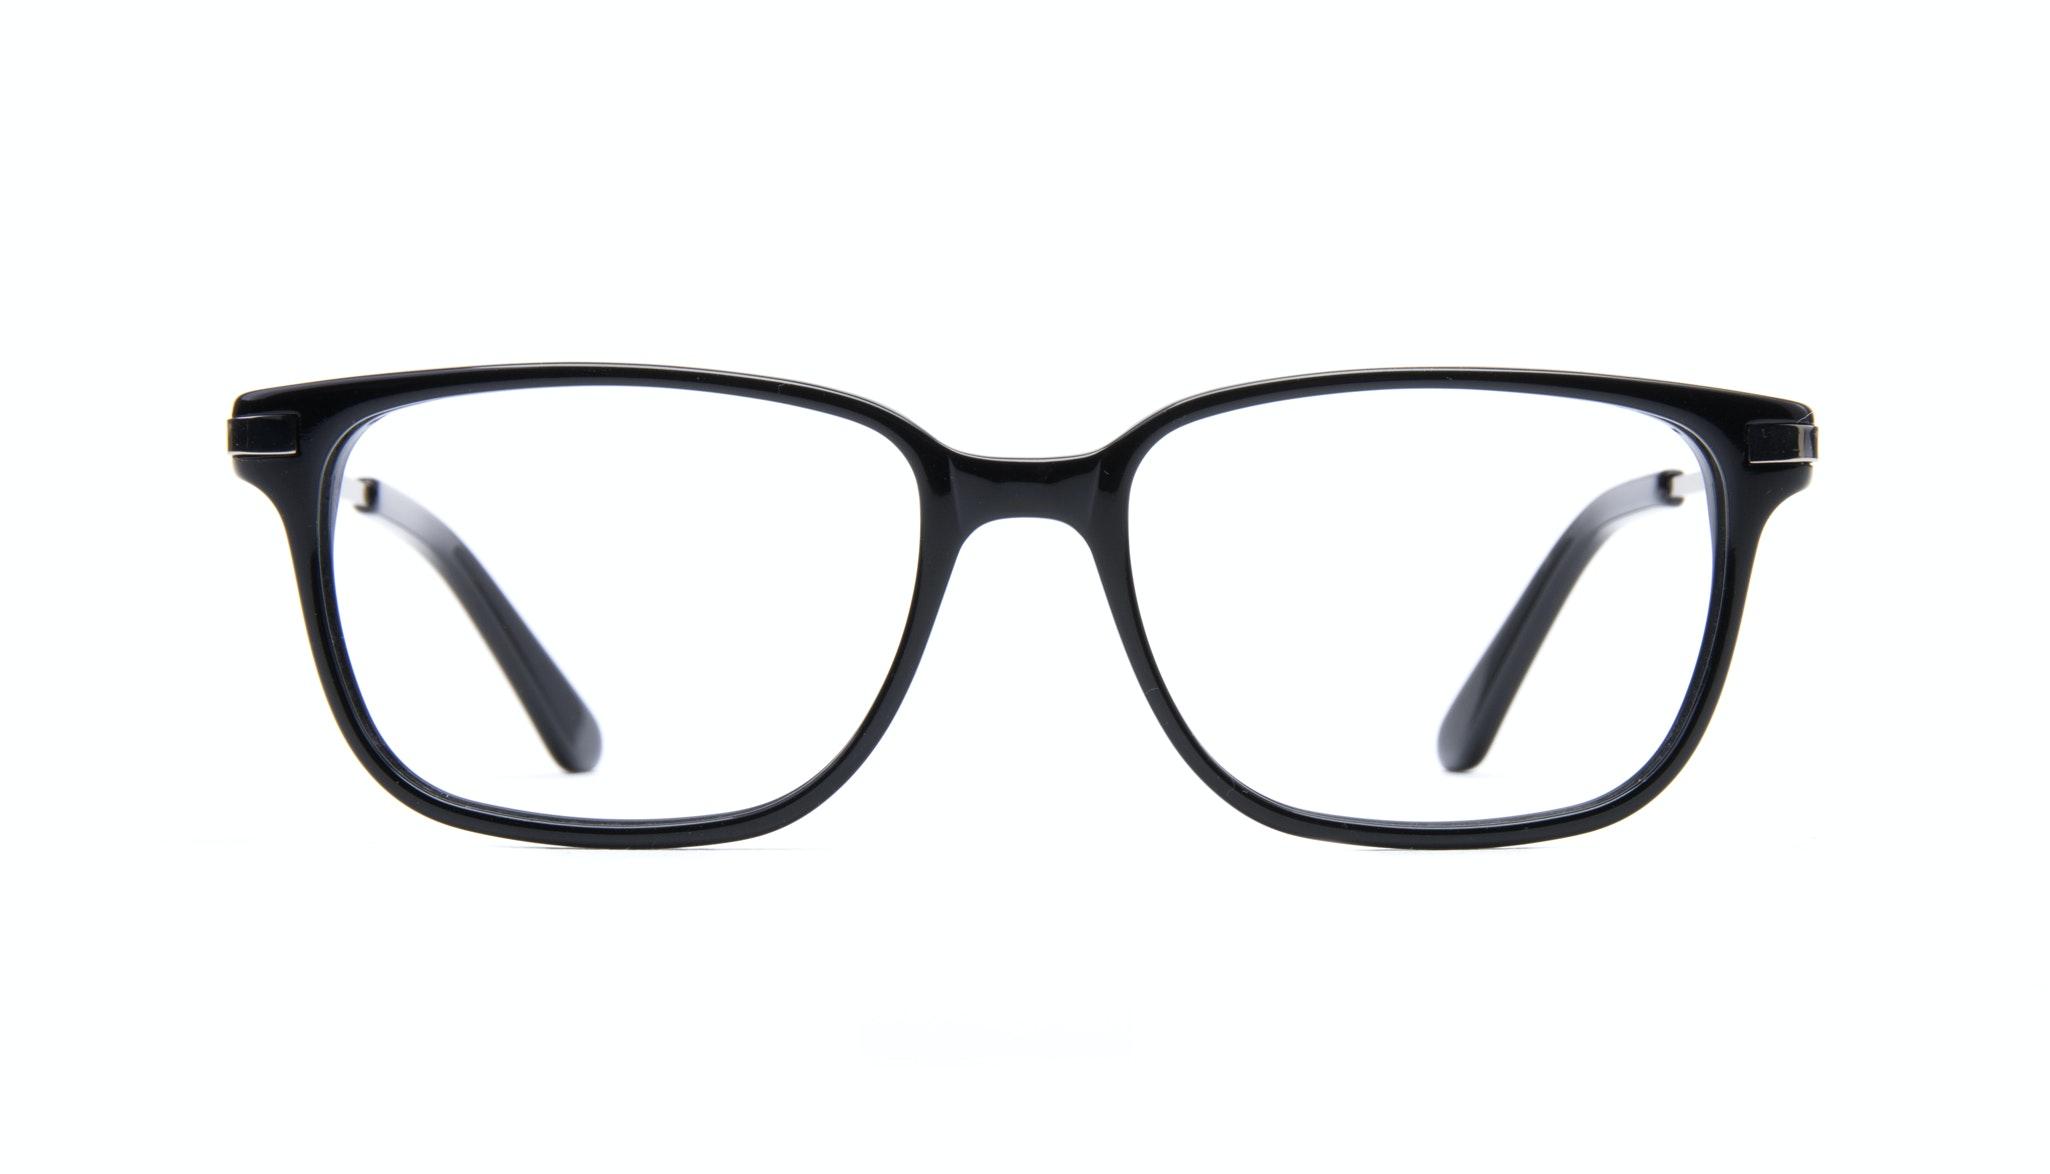 Lunettes tendance Rectangle Optiques Hommes Trade Black